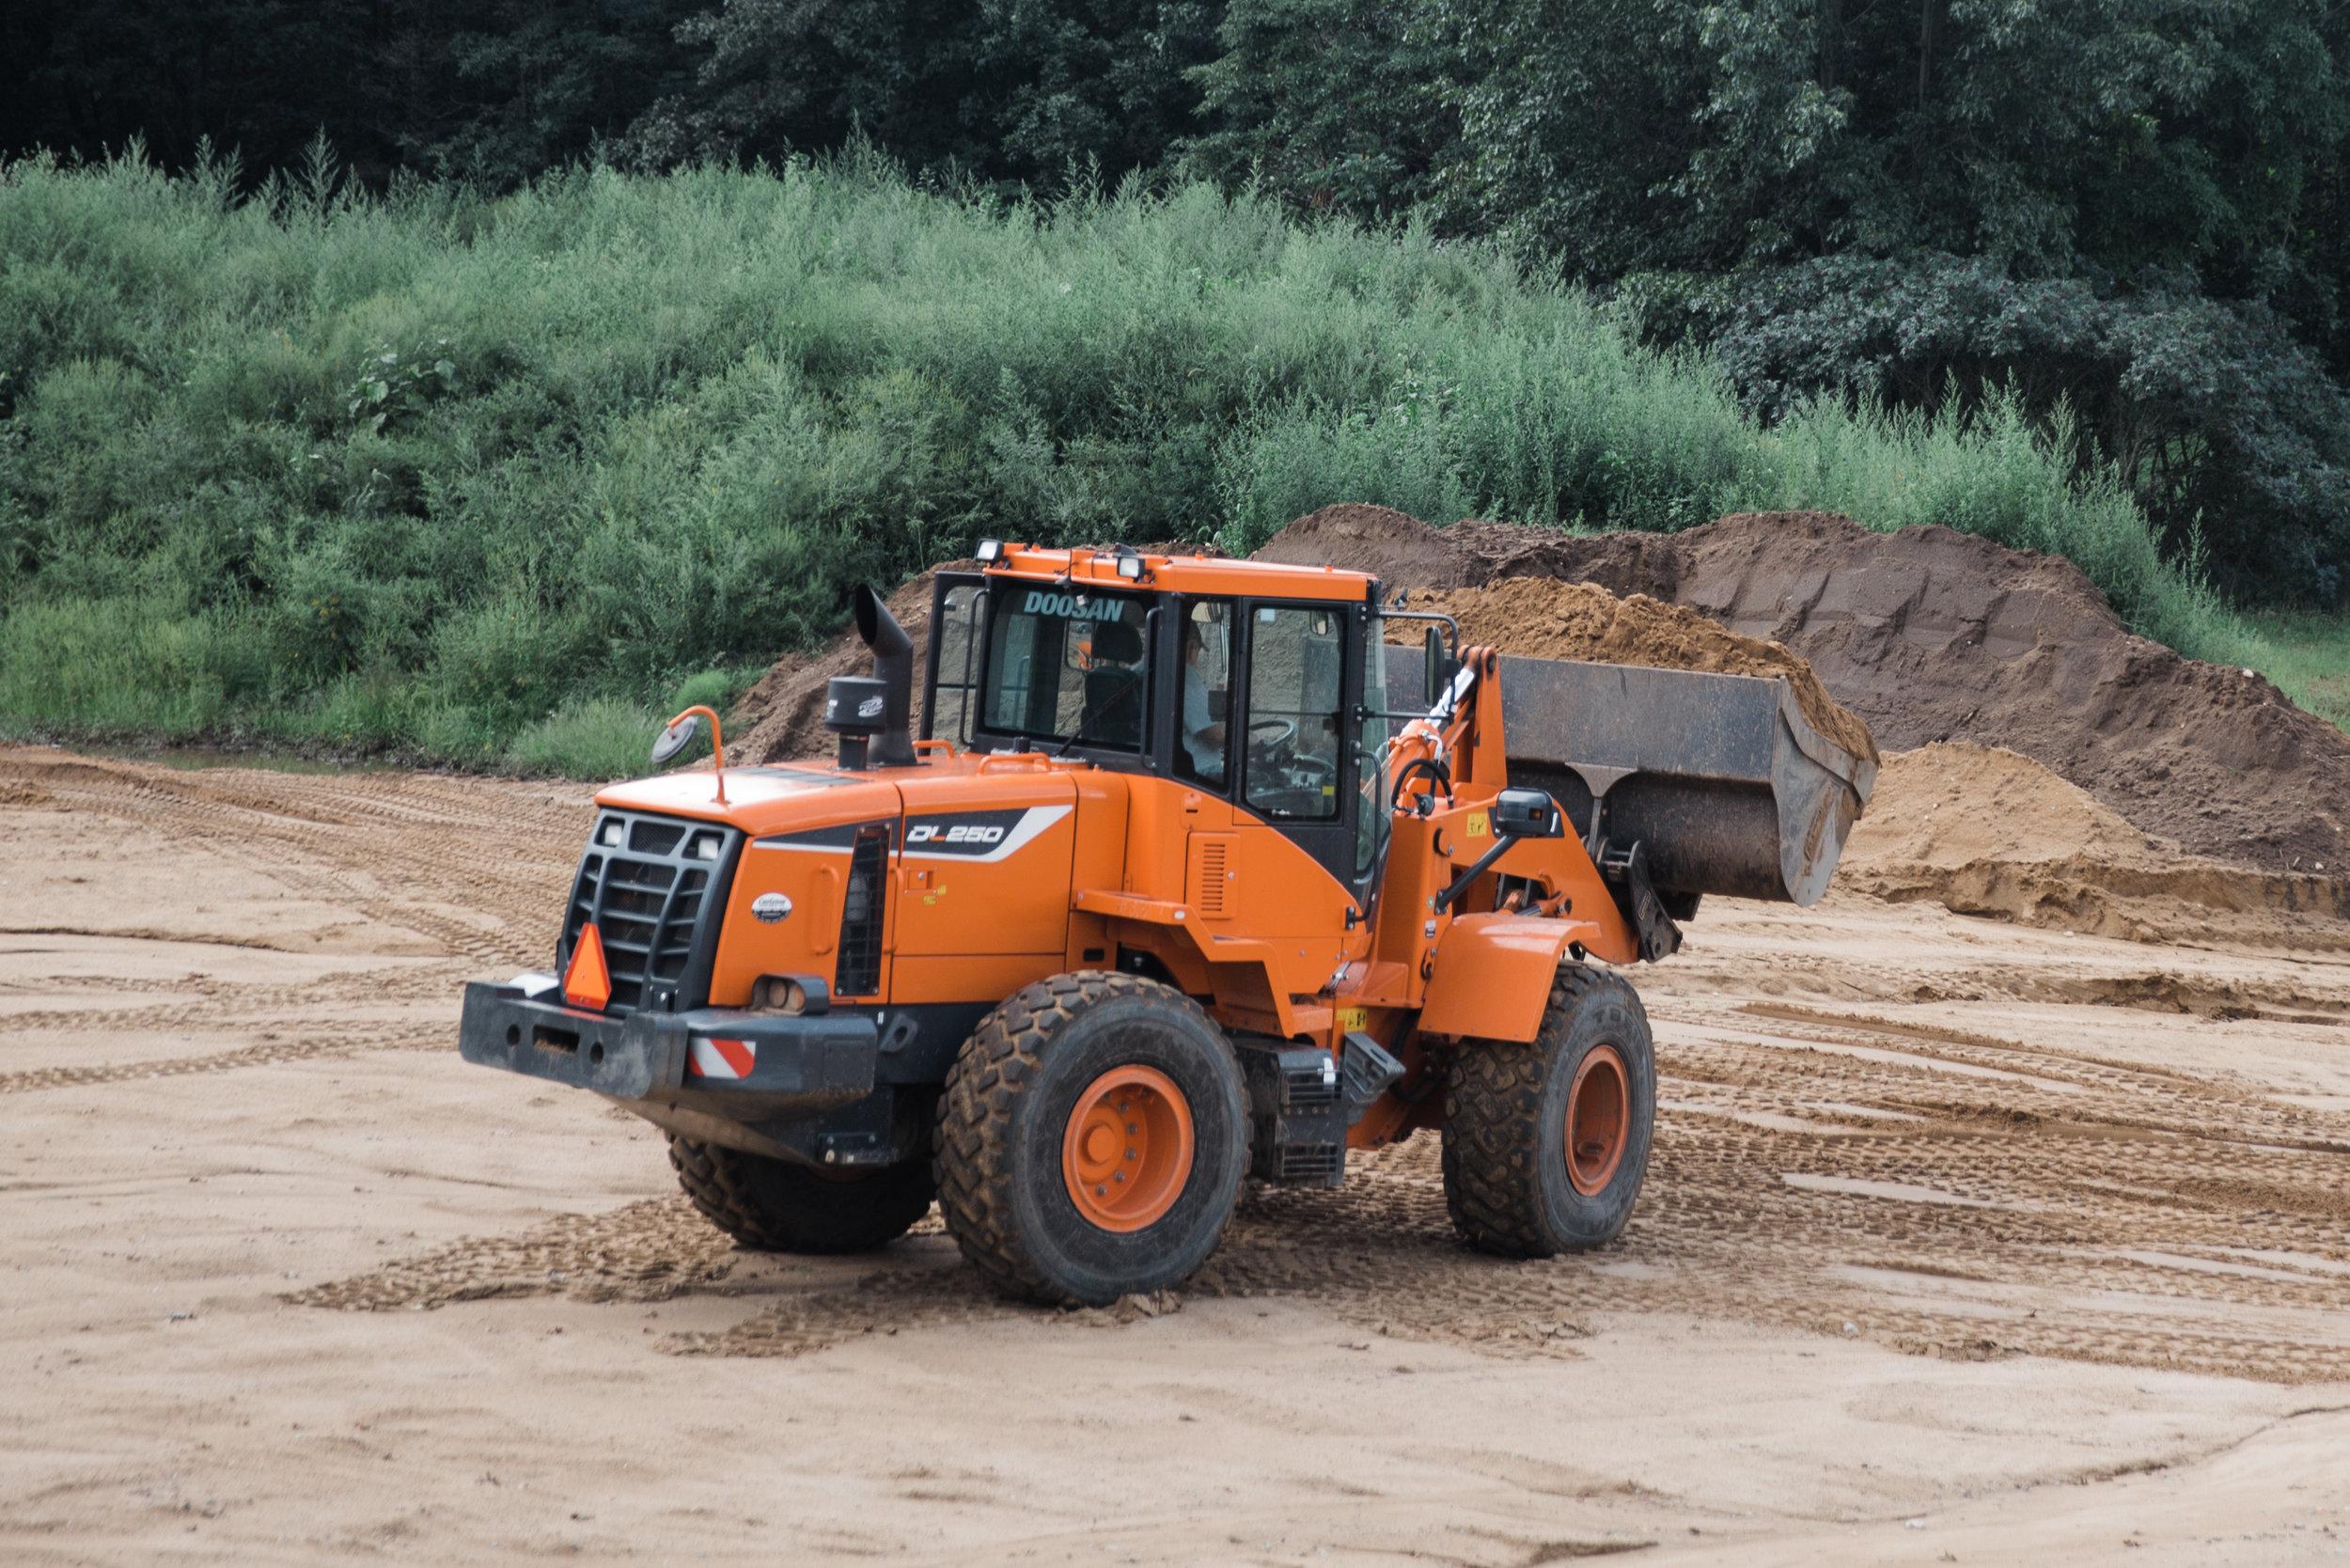 Mattawan Excavators